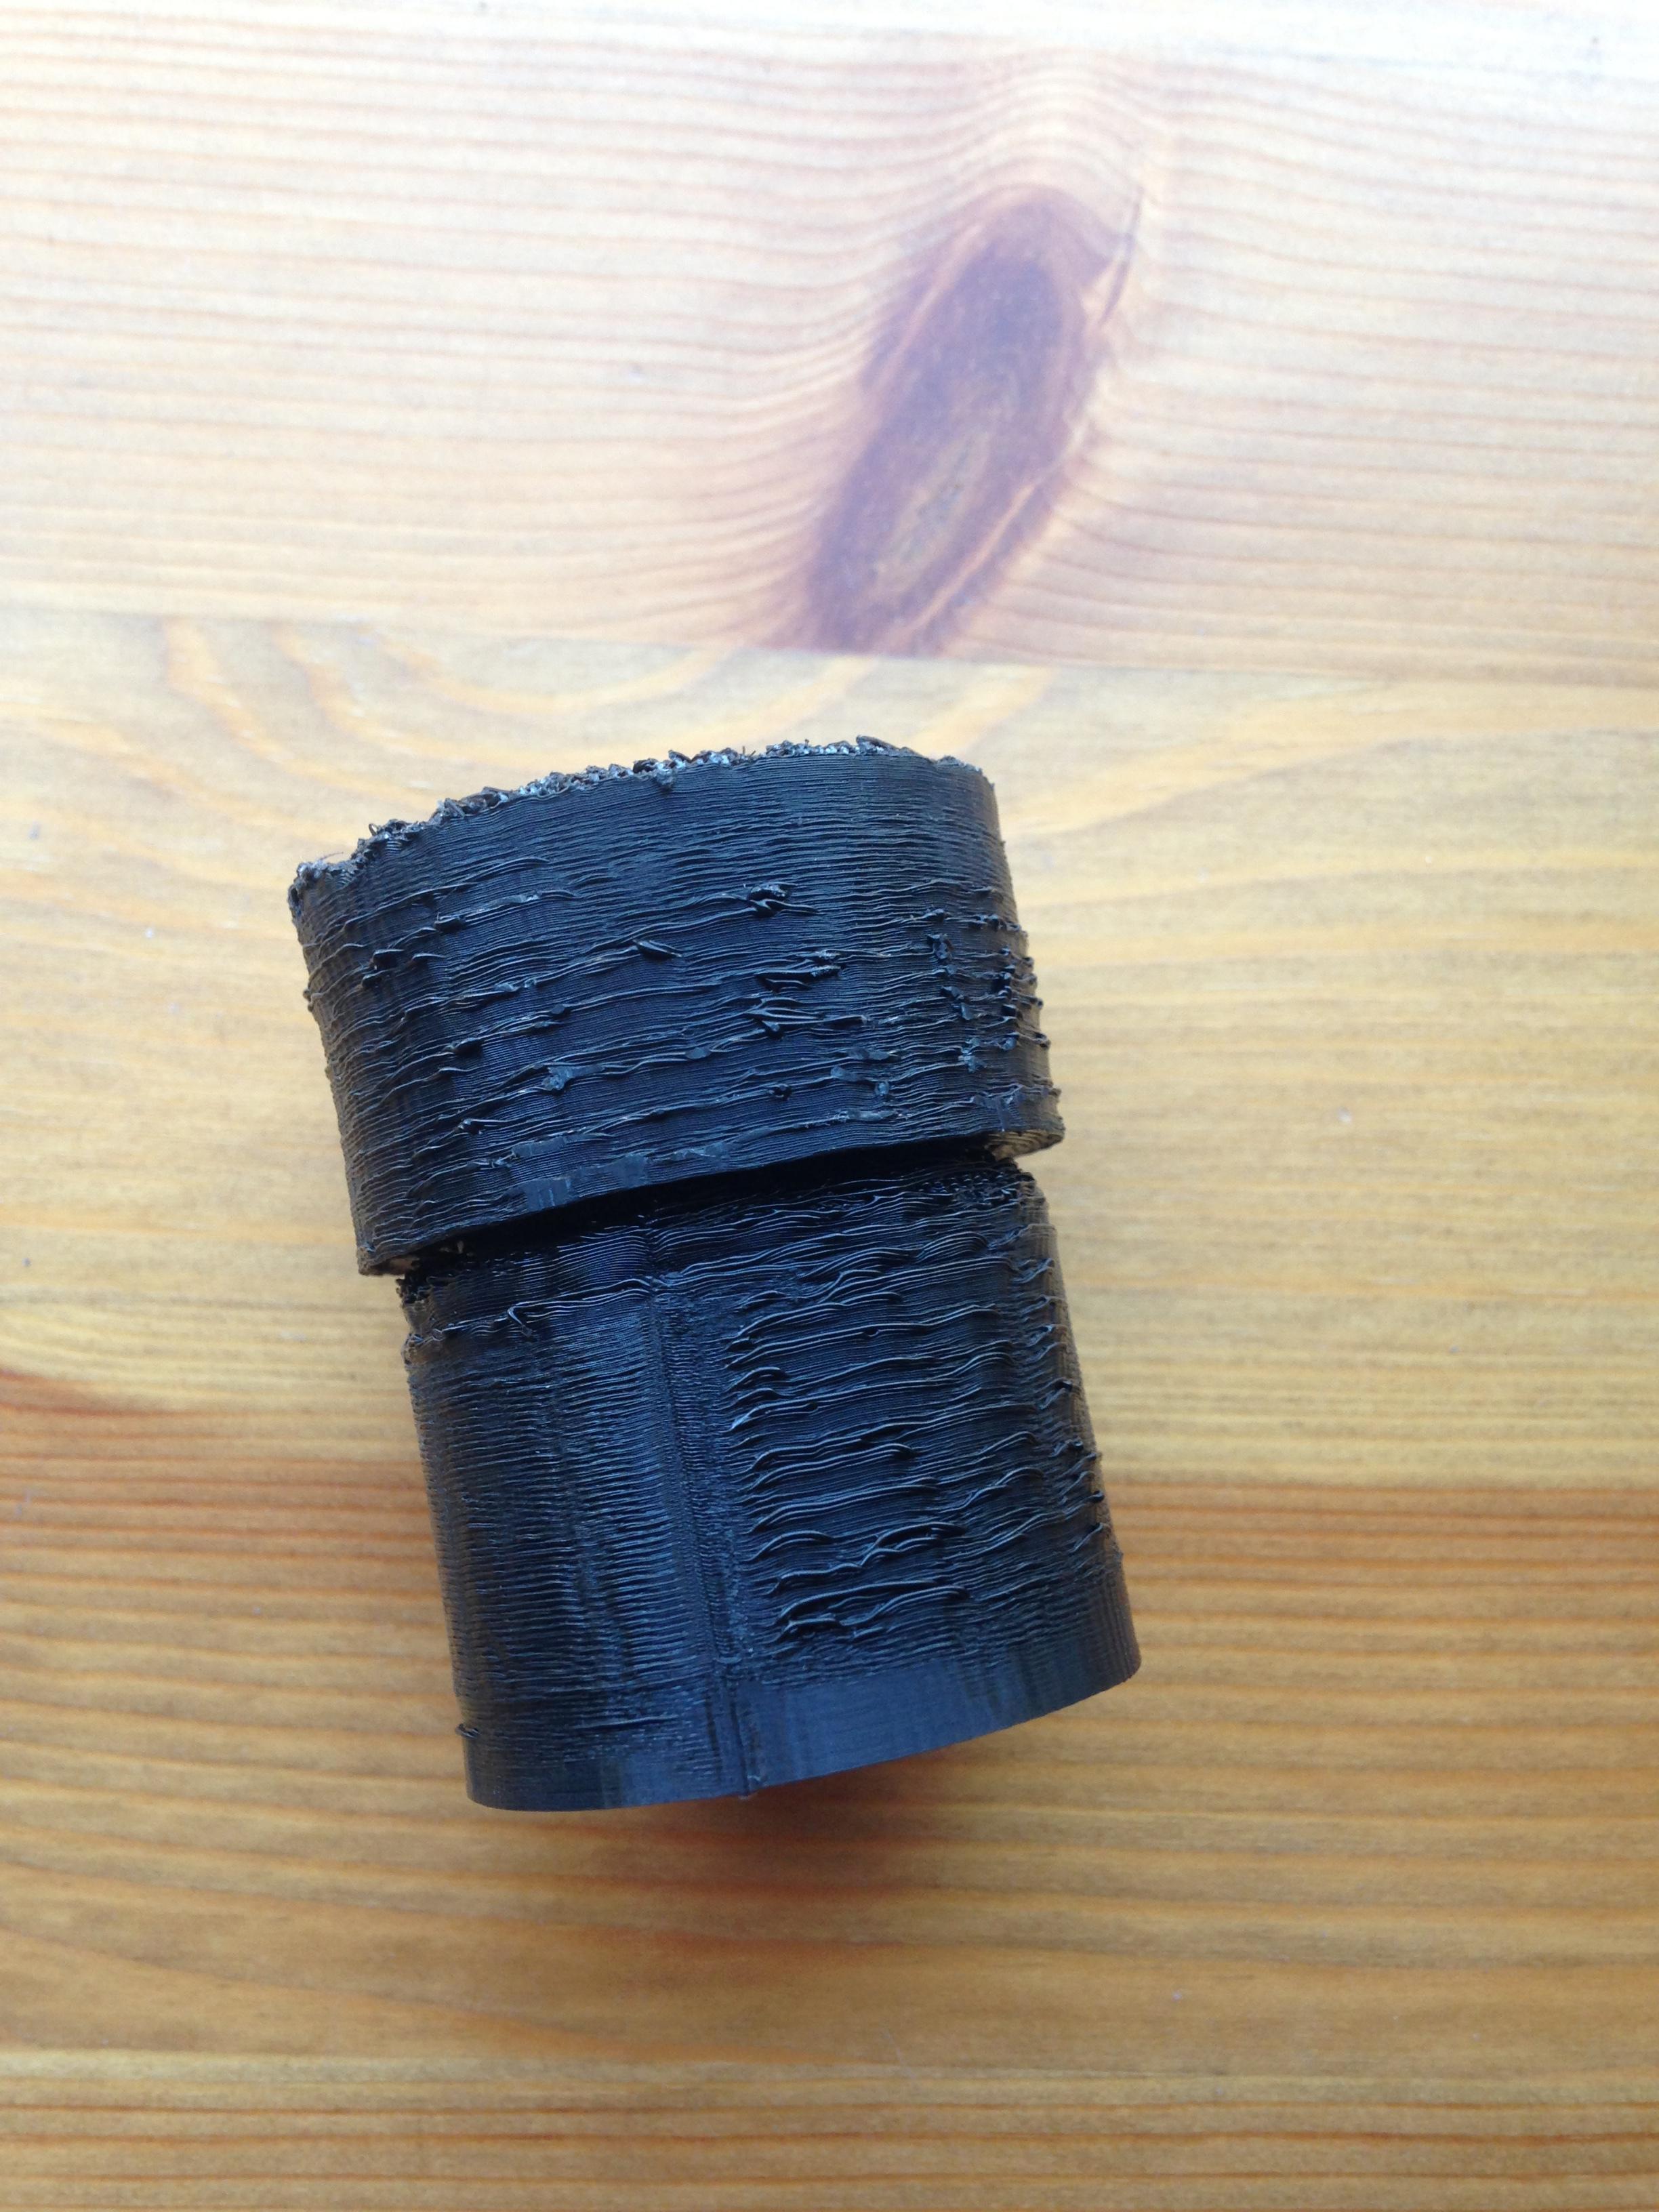 Need some advice, please - 3D Printing / 3D Printers - Talk